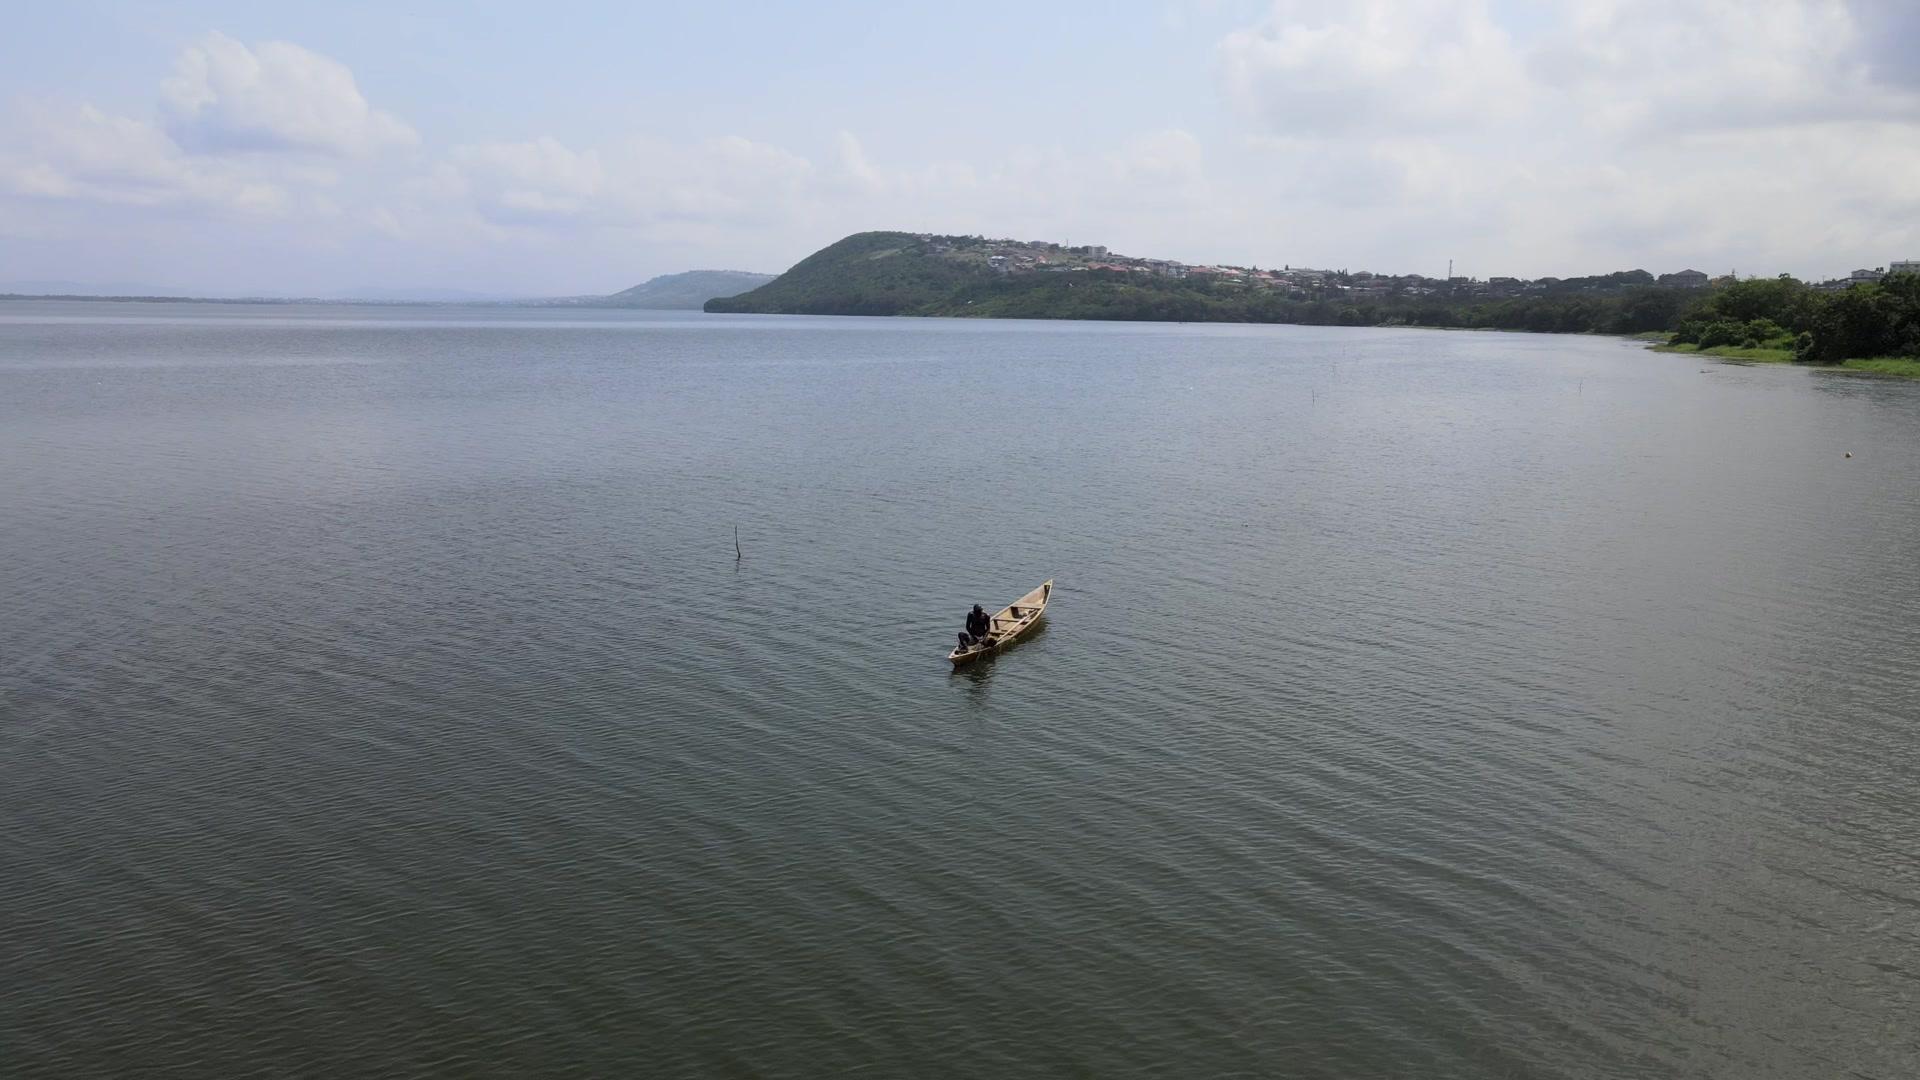 Fishing Fisherman Boat Drifting Lake River